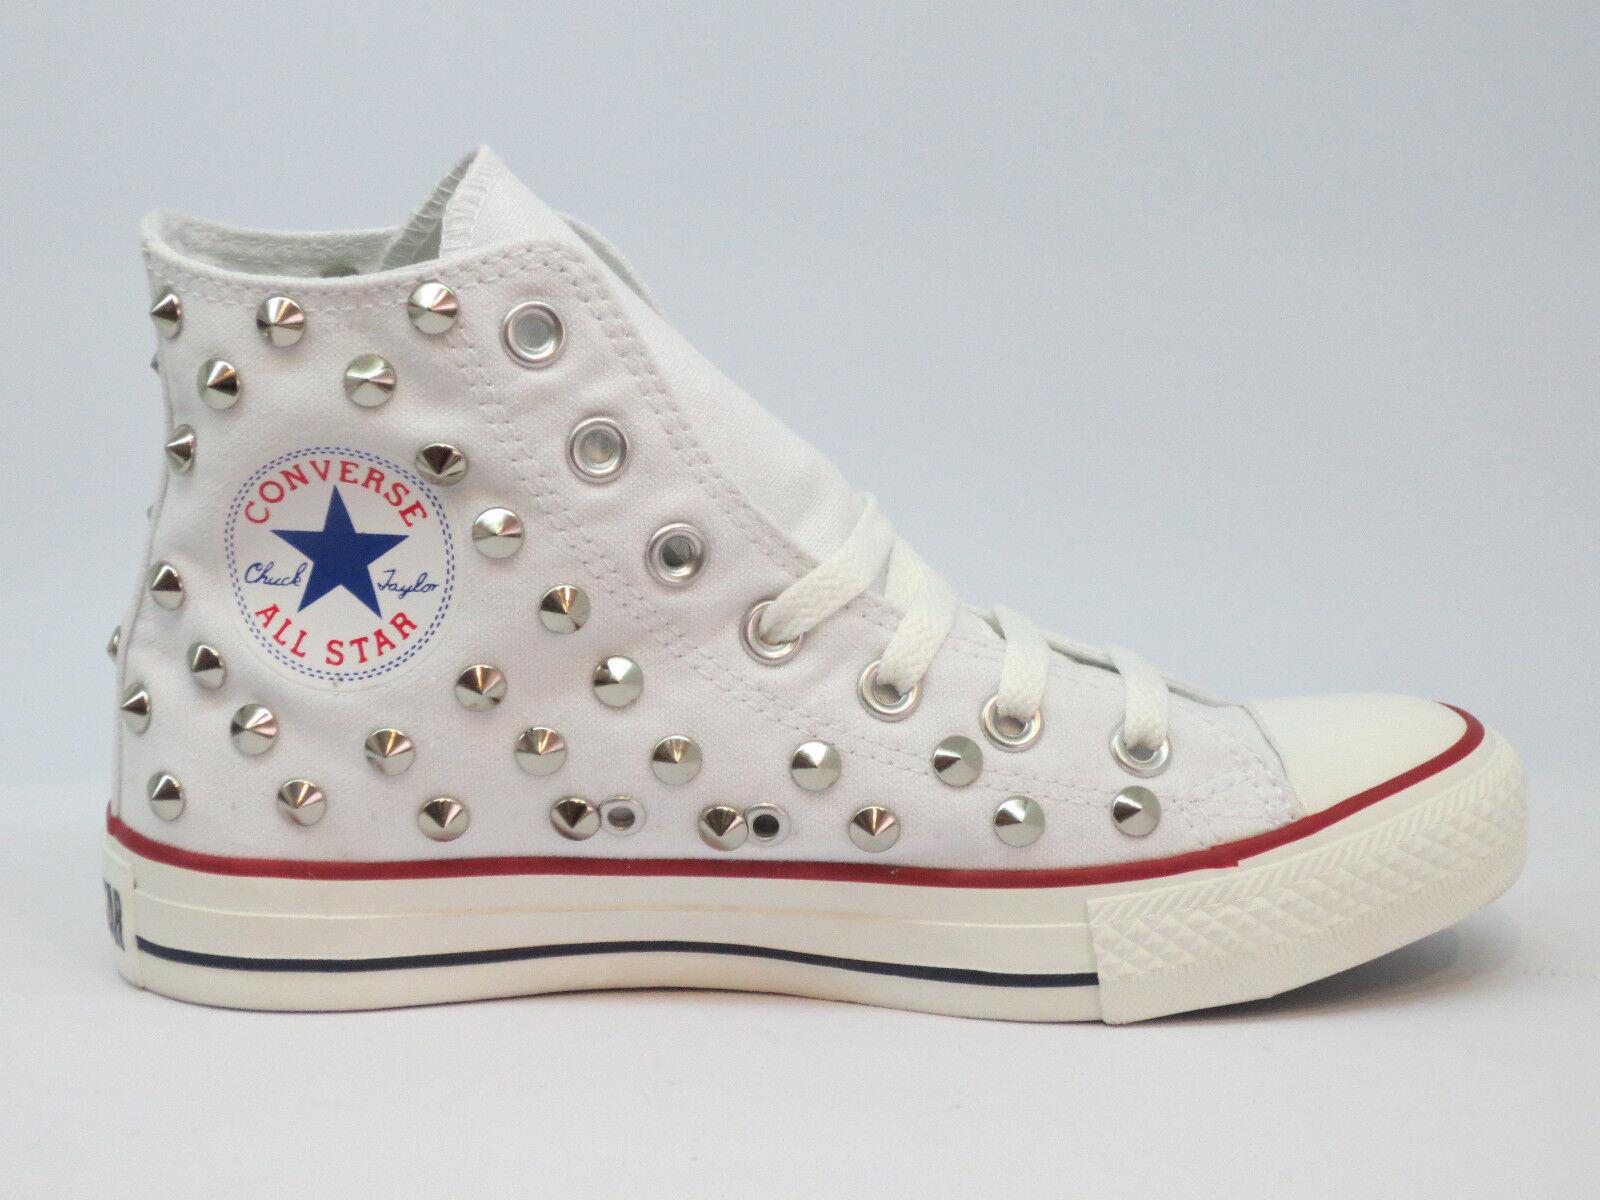 Converse all star Hi borch-ie scarpe donna- uomo bianco optical Blanc artigianali